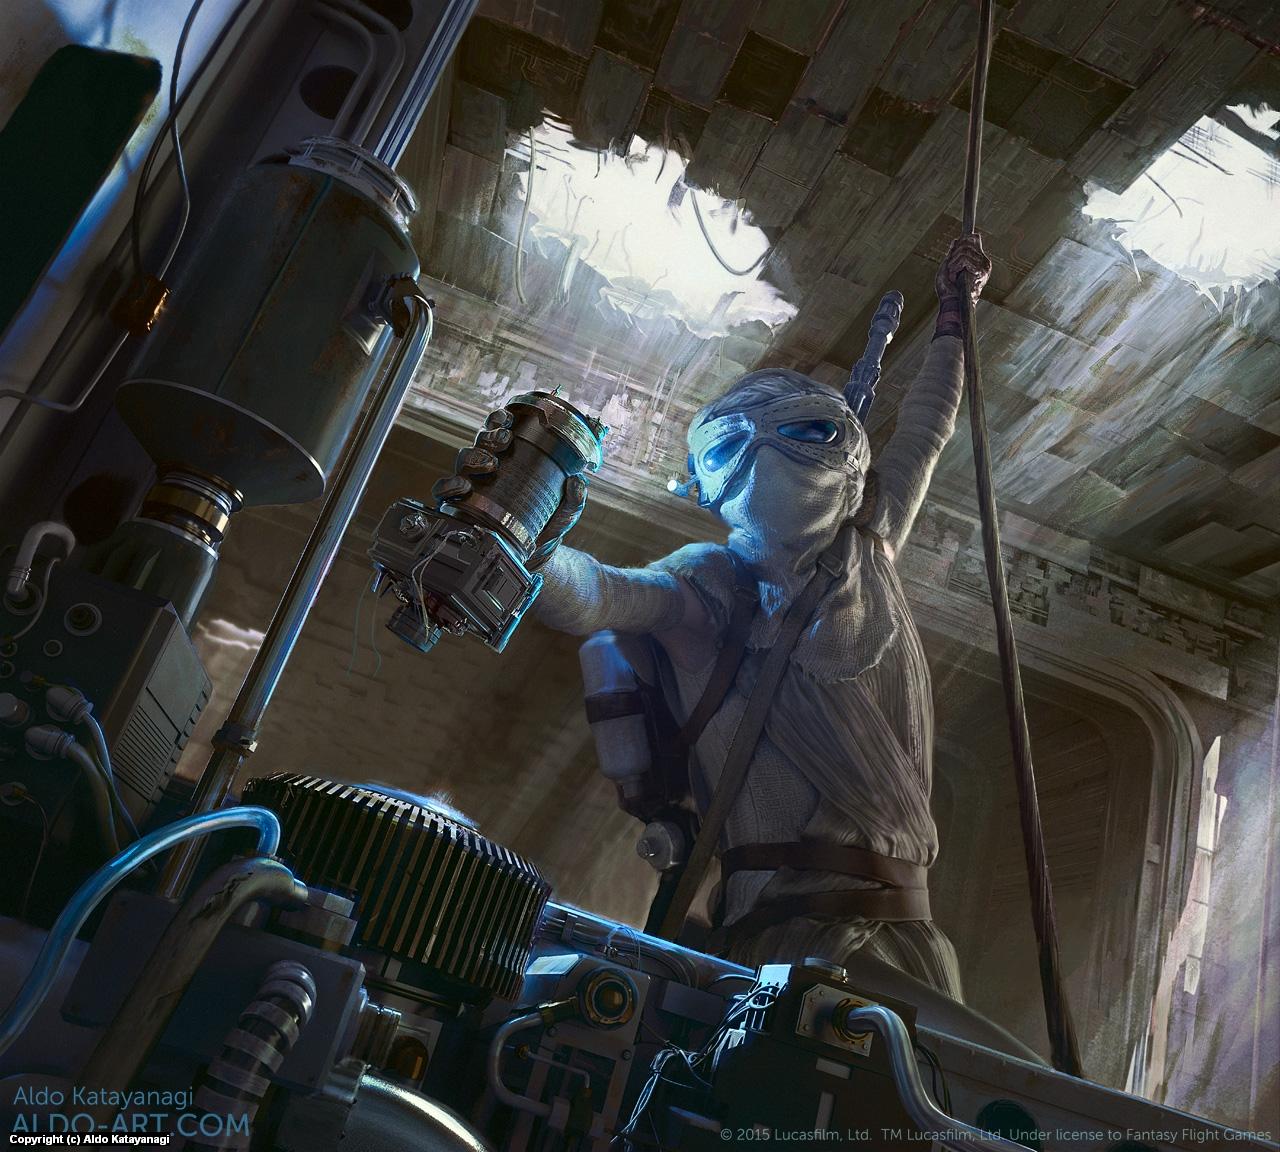 Star Wars Rey Trading Card Artwork by Aldo Katayanagi